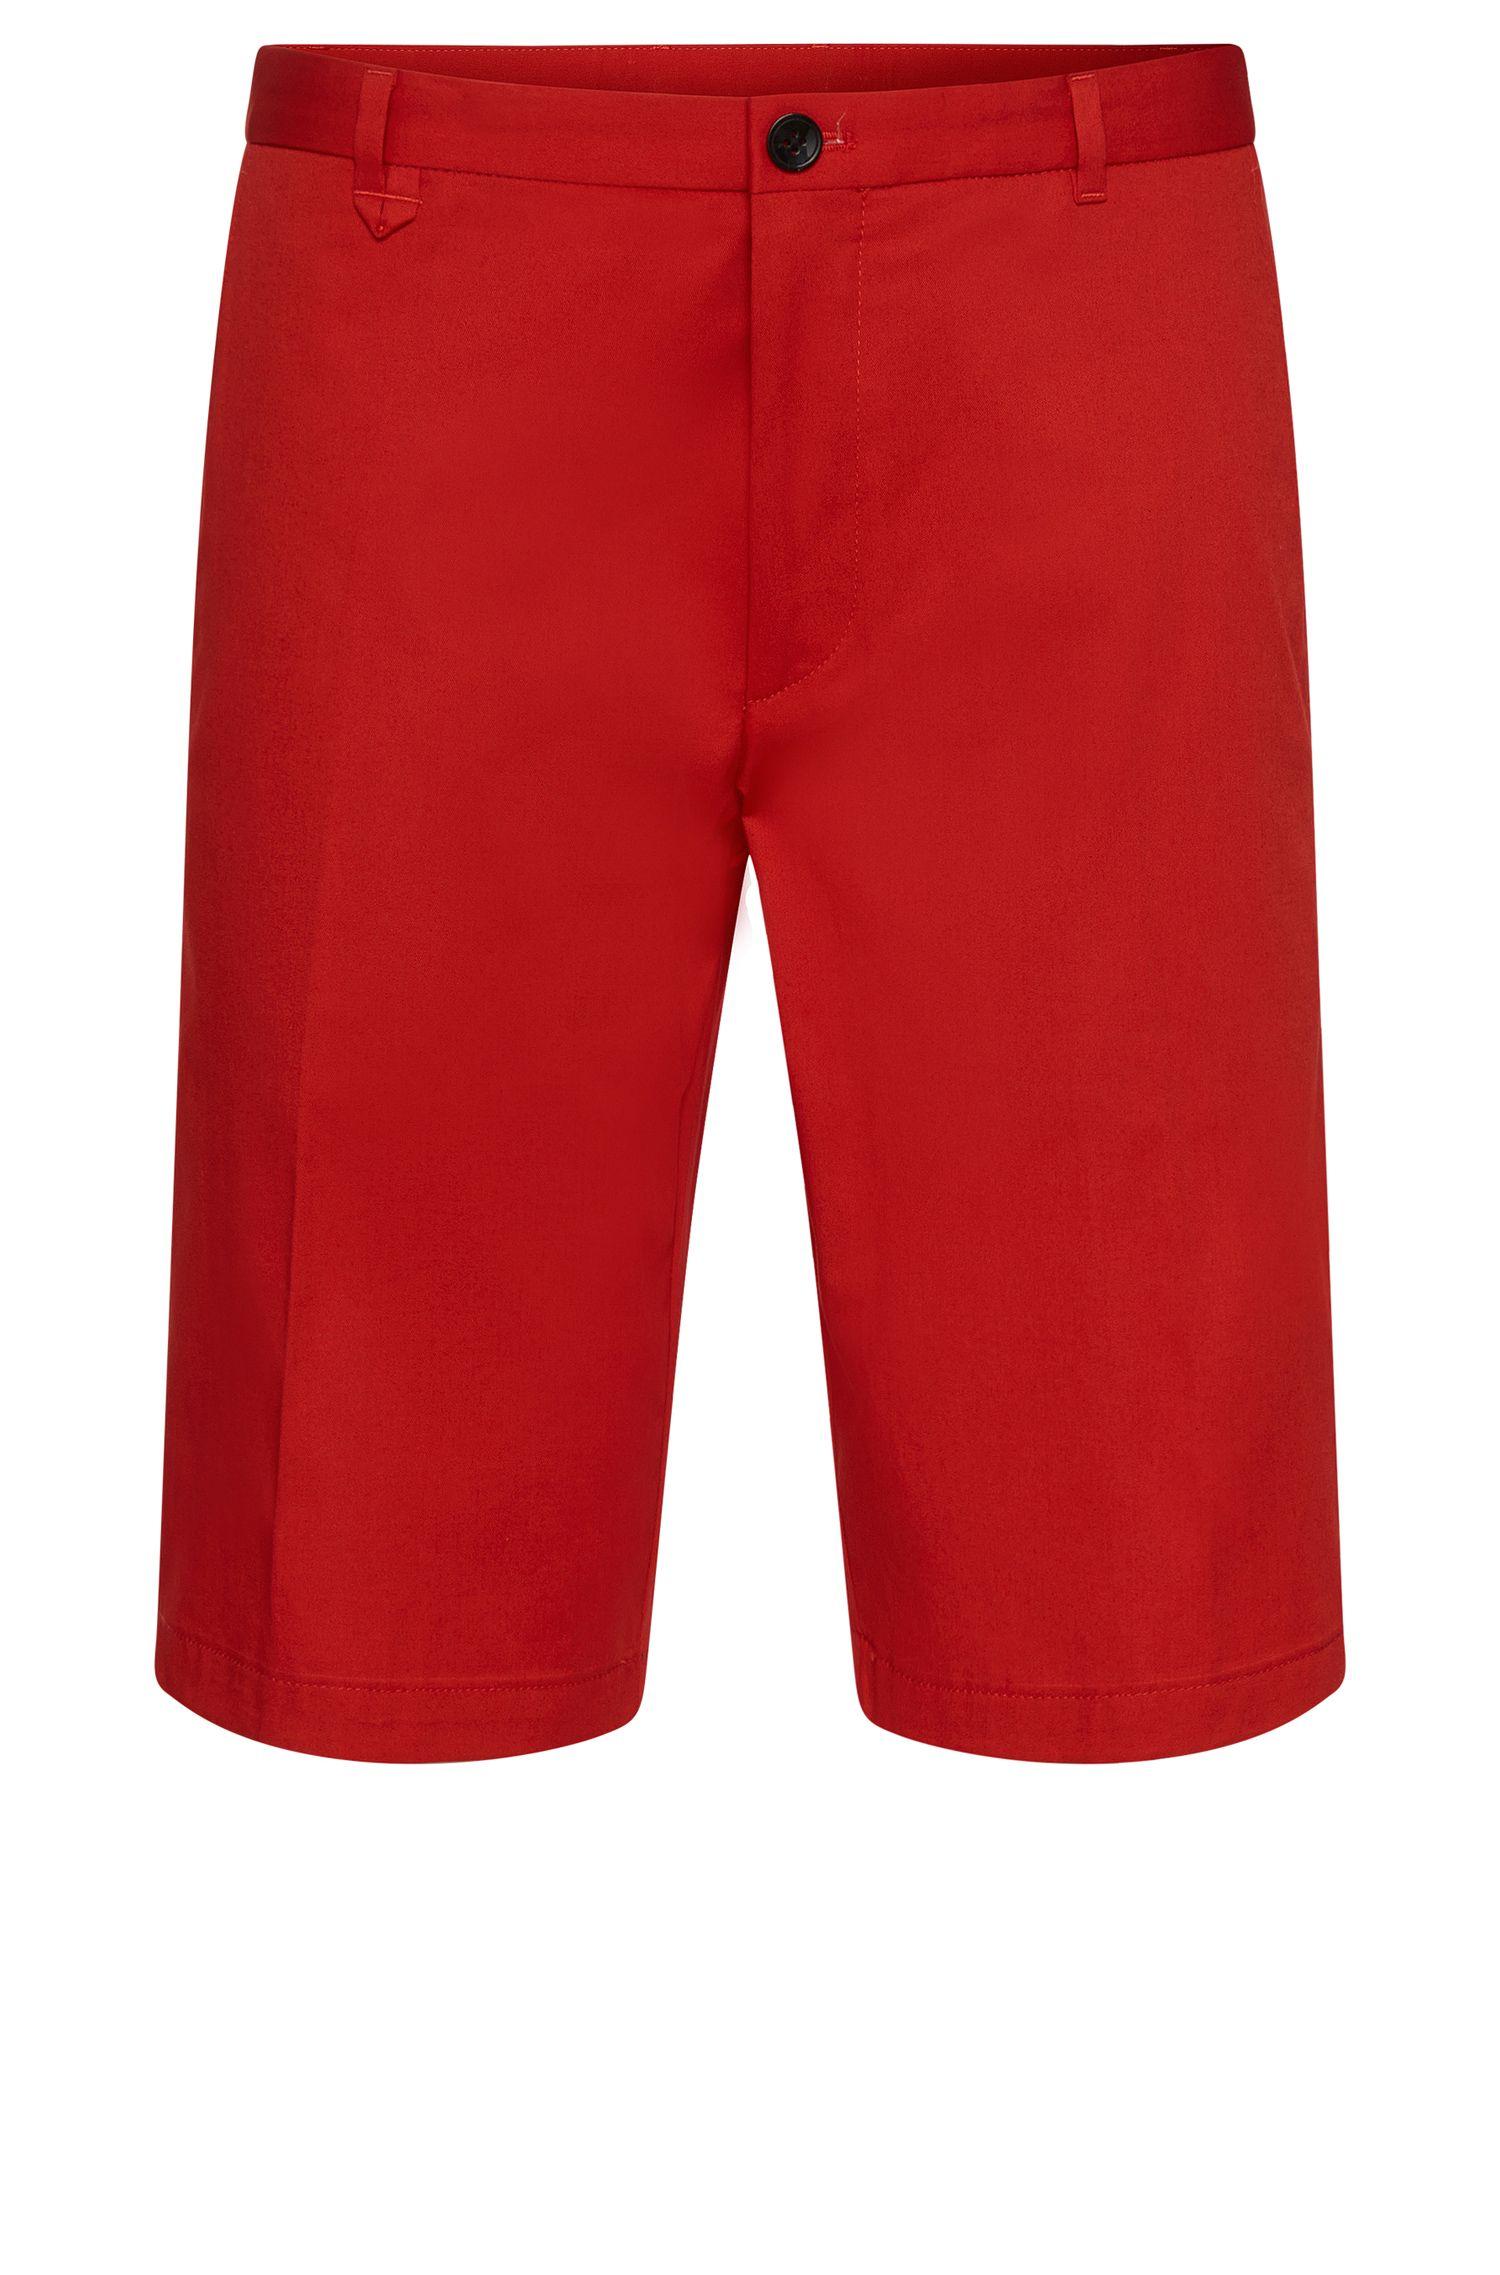 'Hano'   Slim Fit, Stretch Cotton Shorts